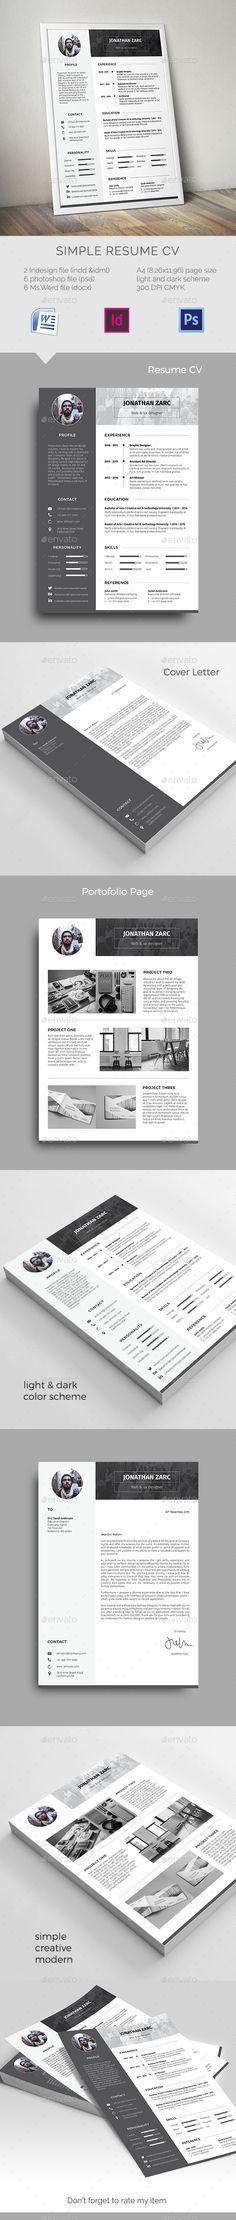 simple cover letter%0A Resume  cover letter  brag book  Sleek design